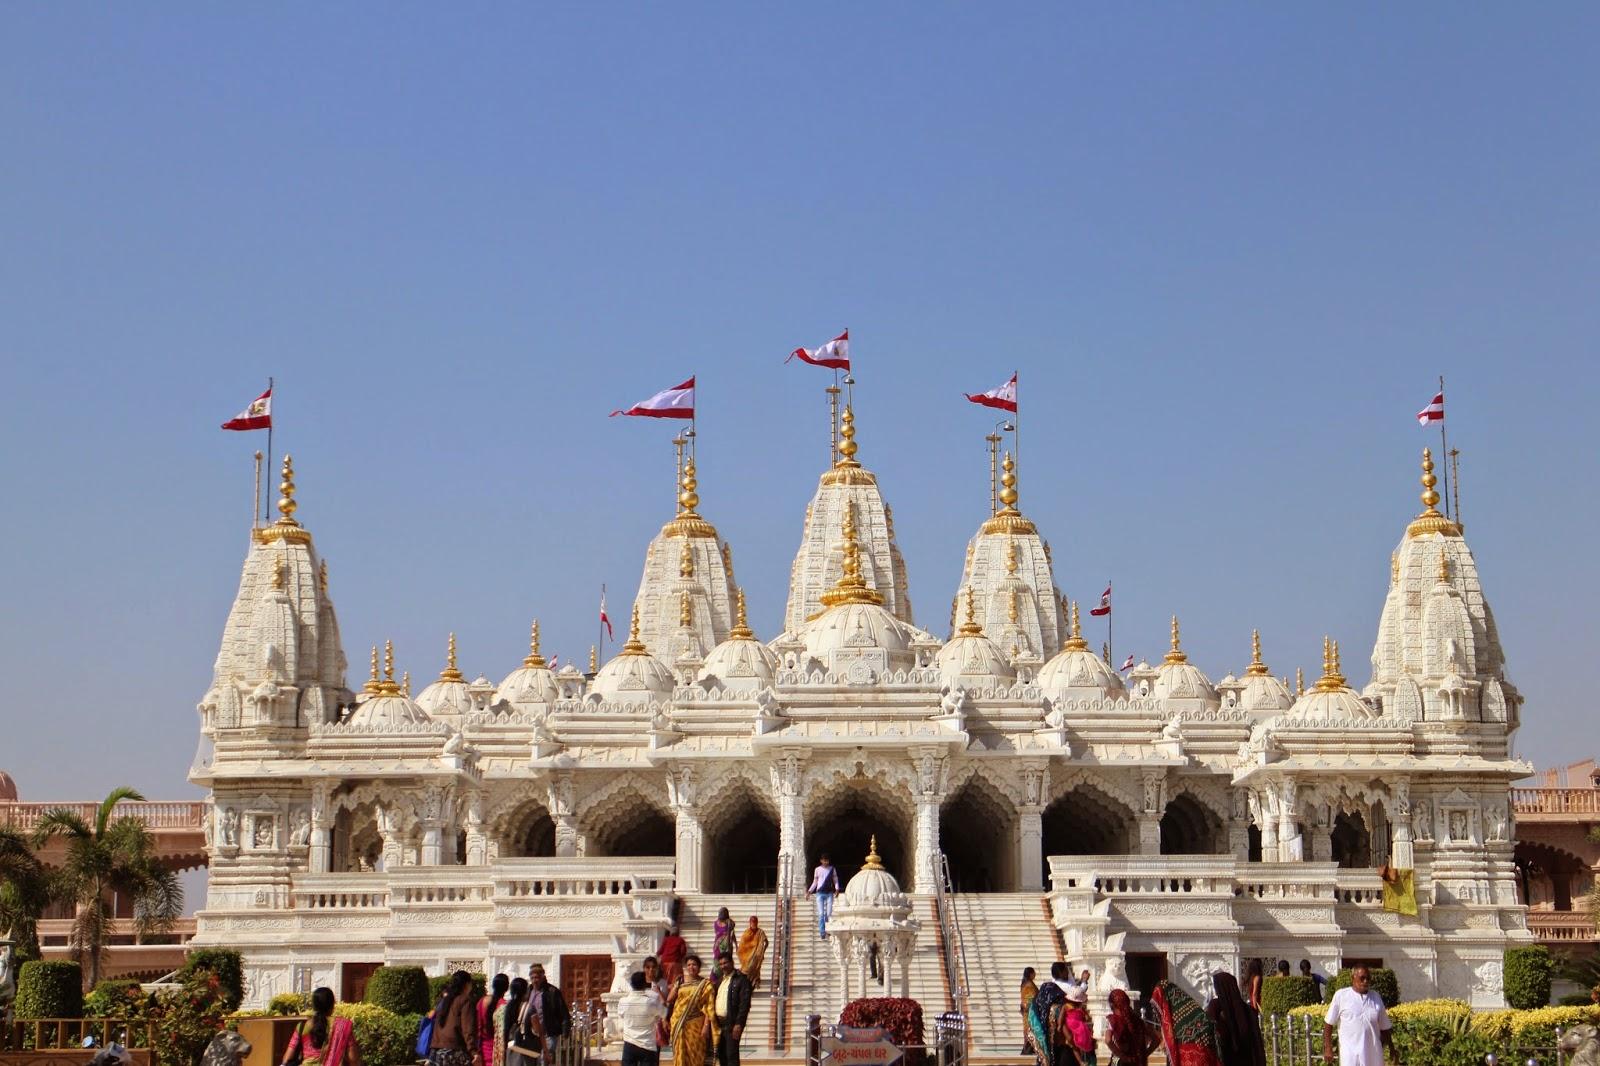 Swaminarayan Temple, Swaminarayan Temple Bhuj, Kutch, Gujarat, Gujarat Tourism